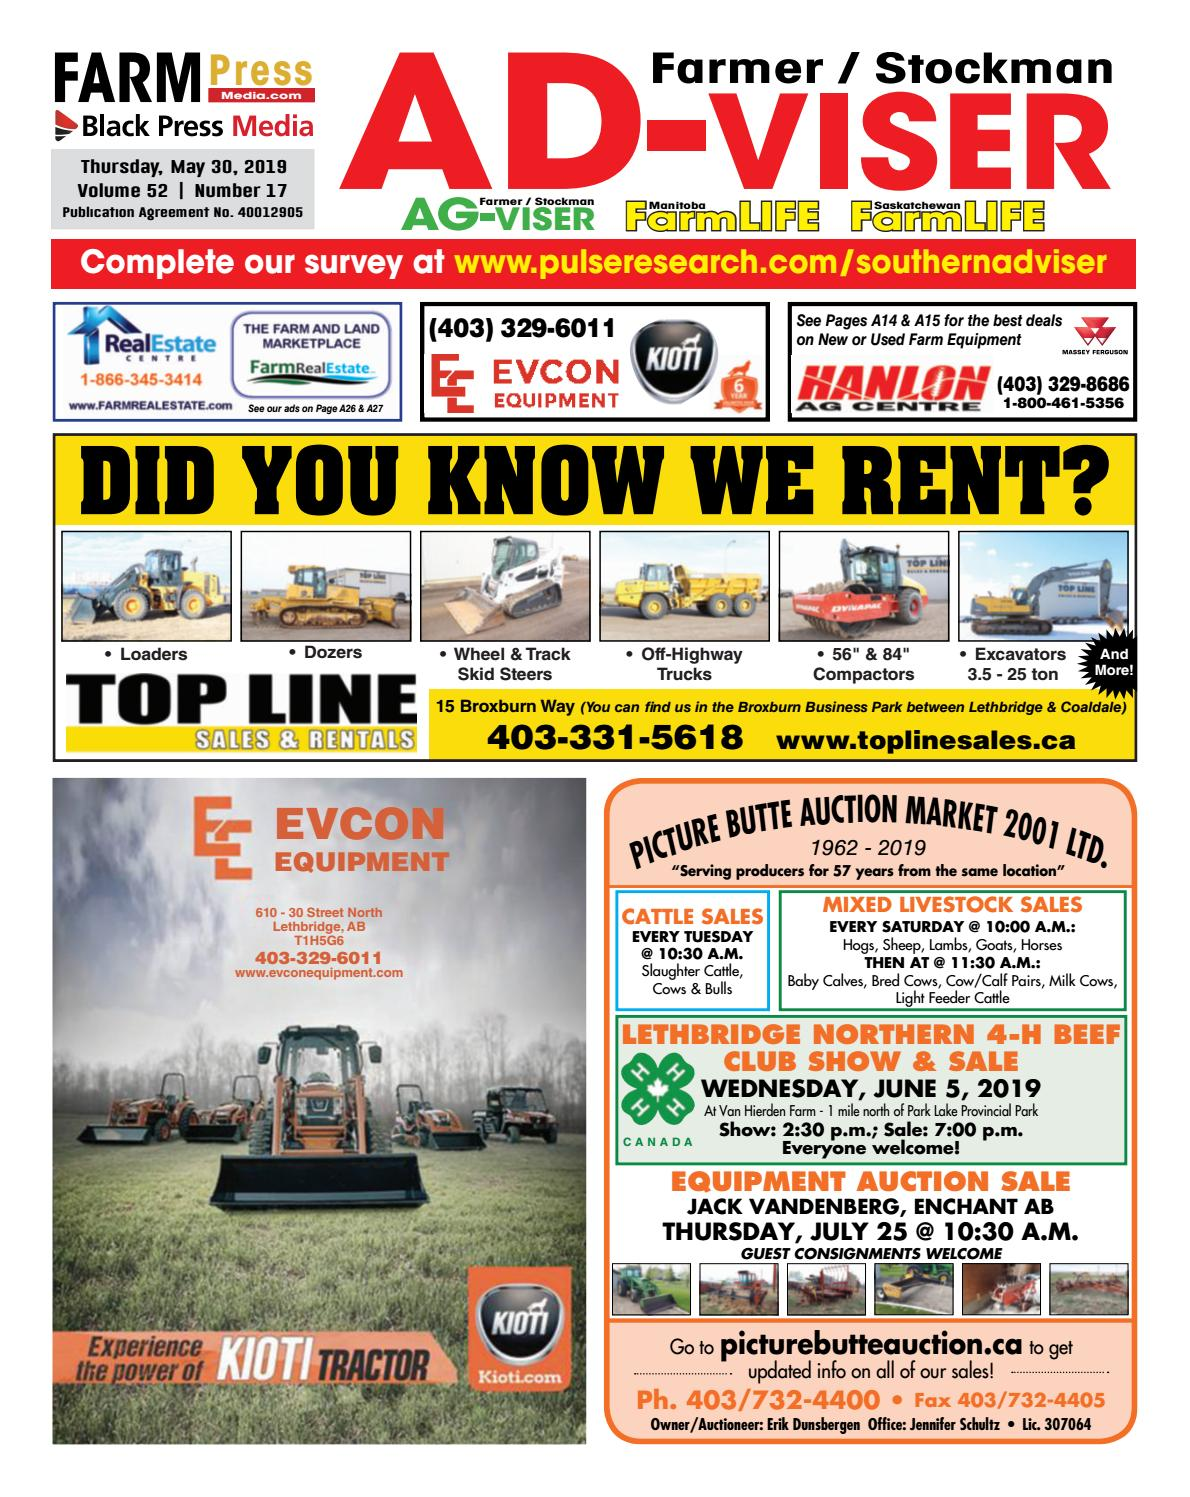 Southern Alberta Advisor, May 30, 2019 by Black Press Media